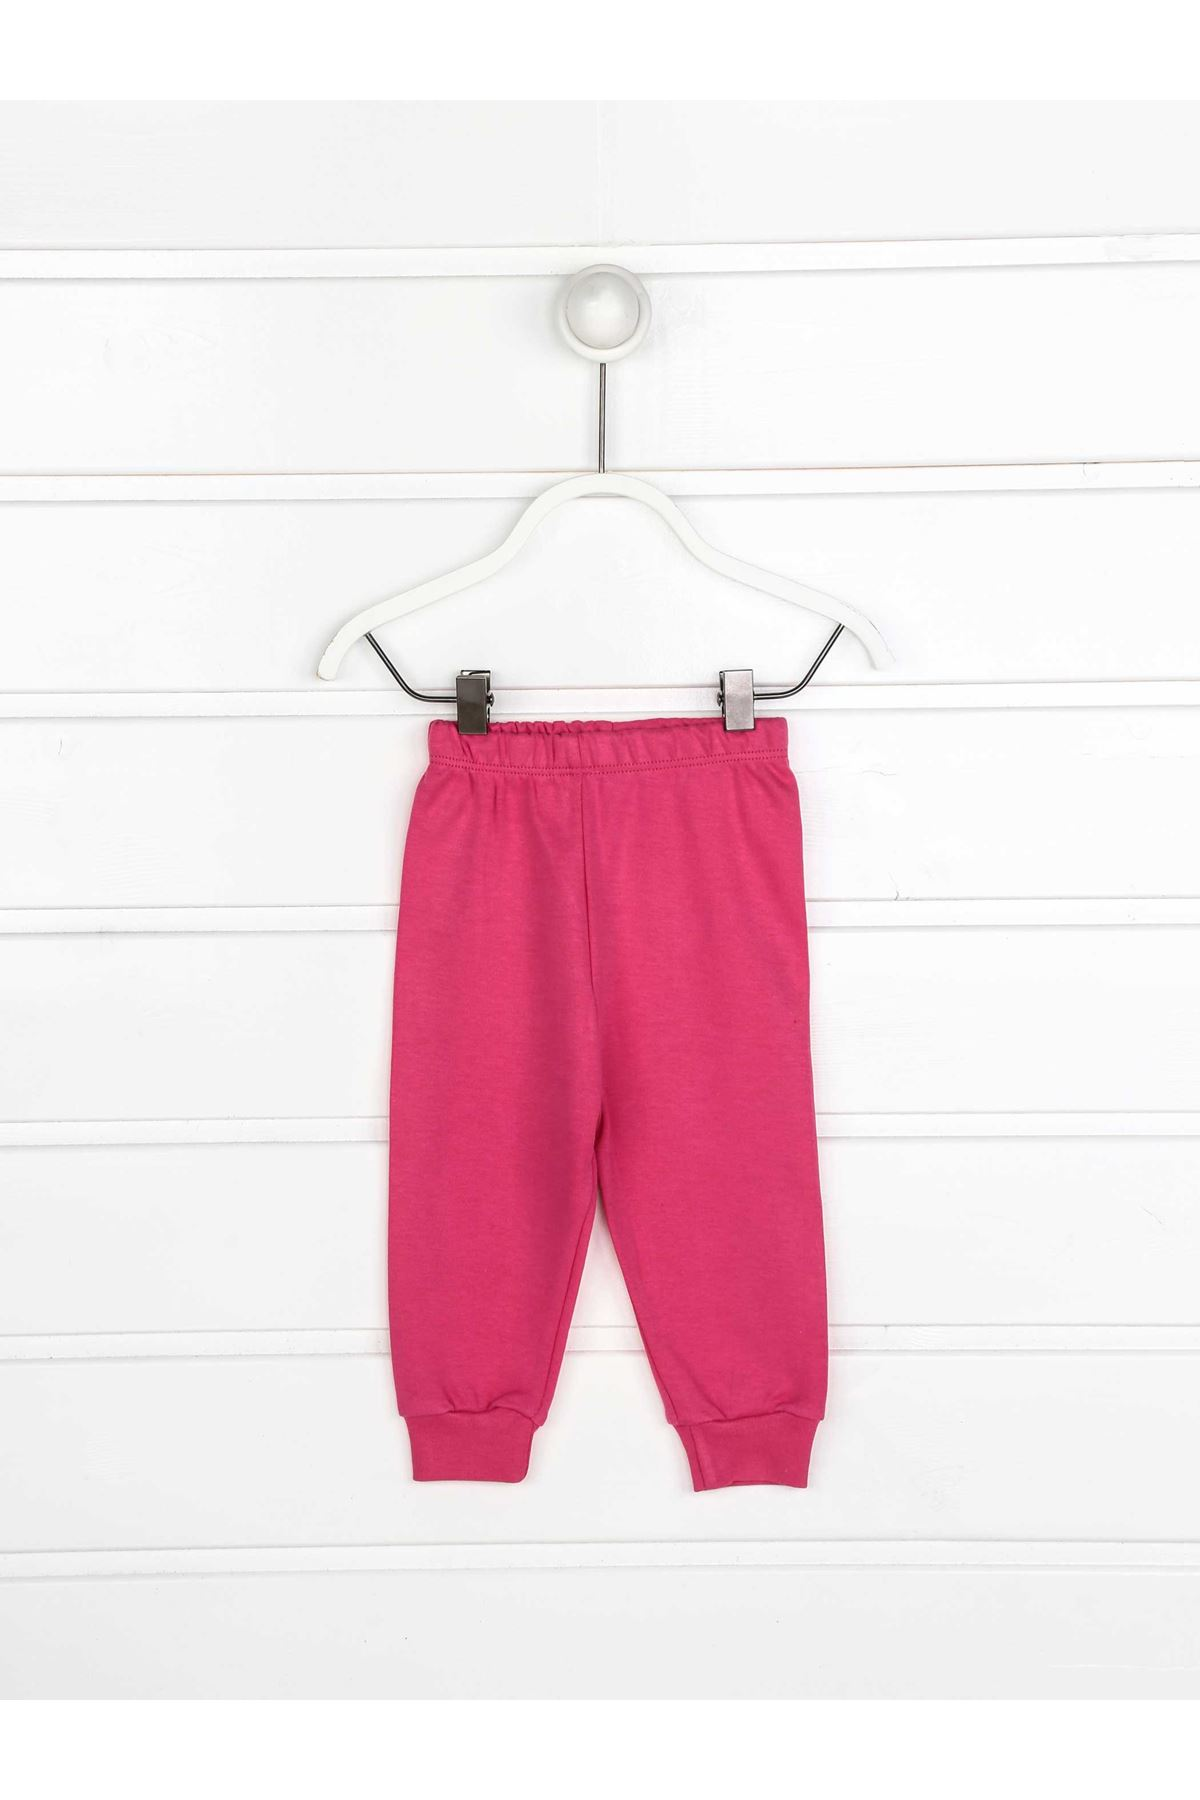 Fuchsia Girls Baby 2 Piece Suit